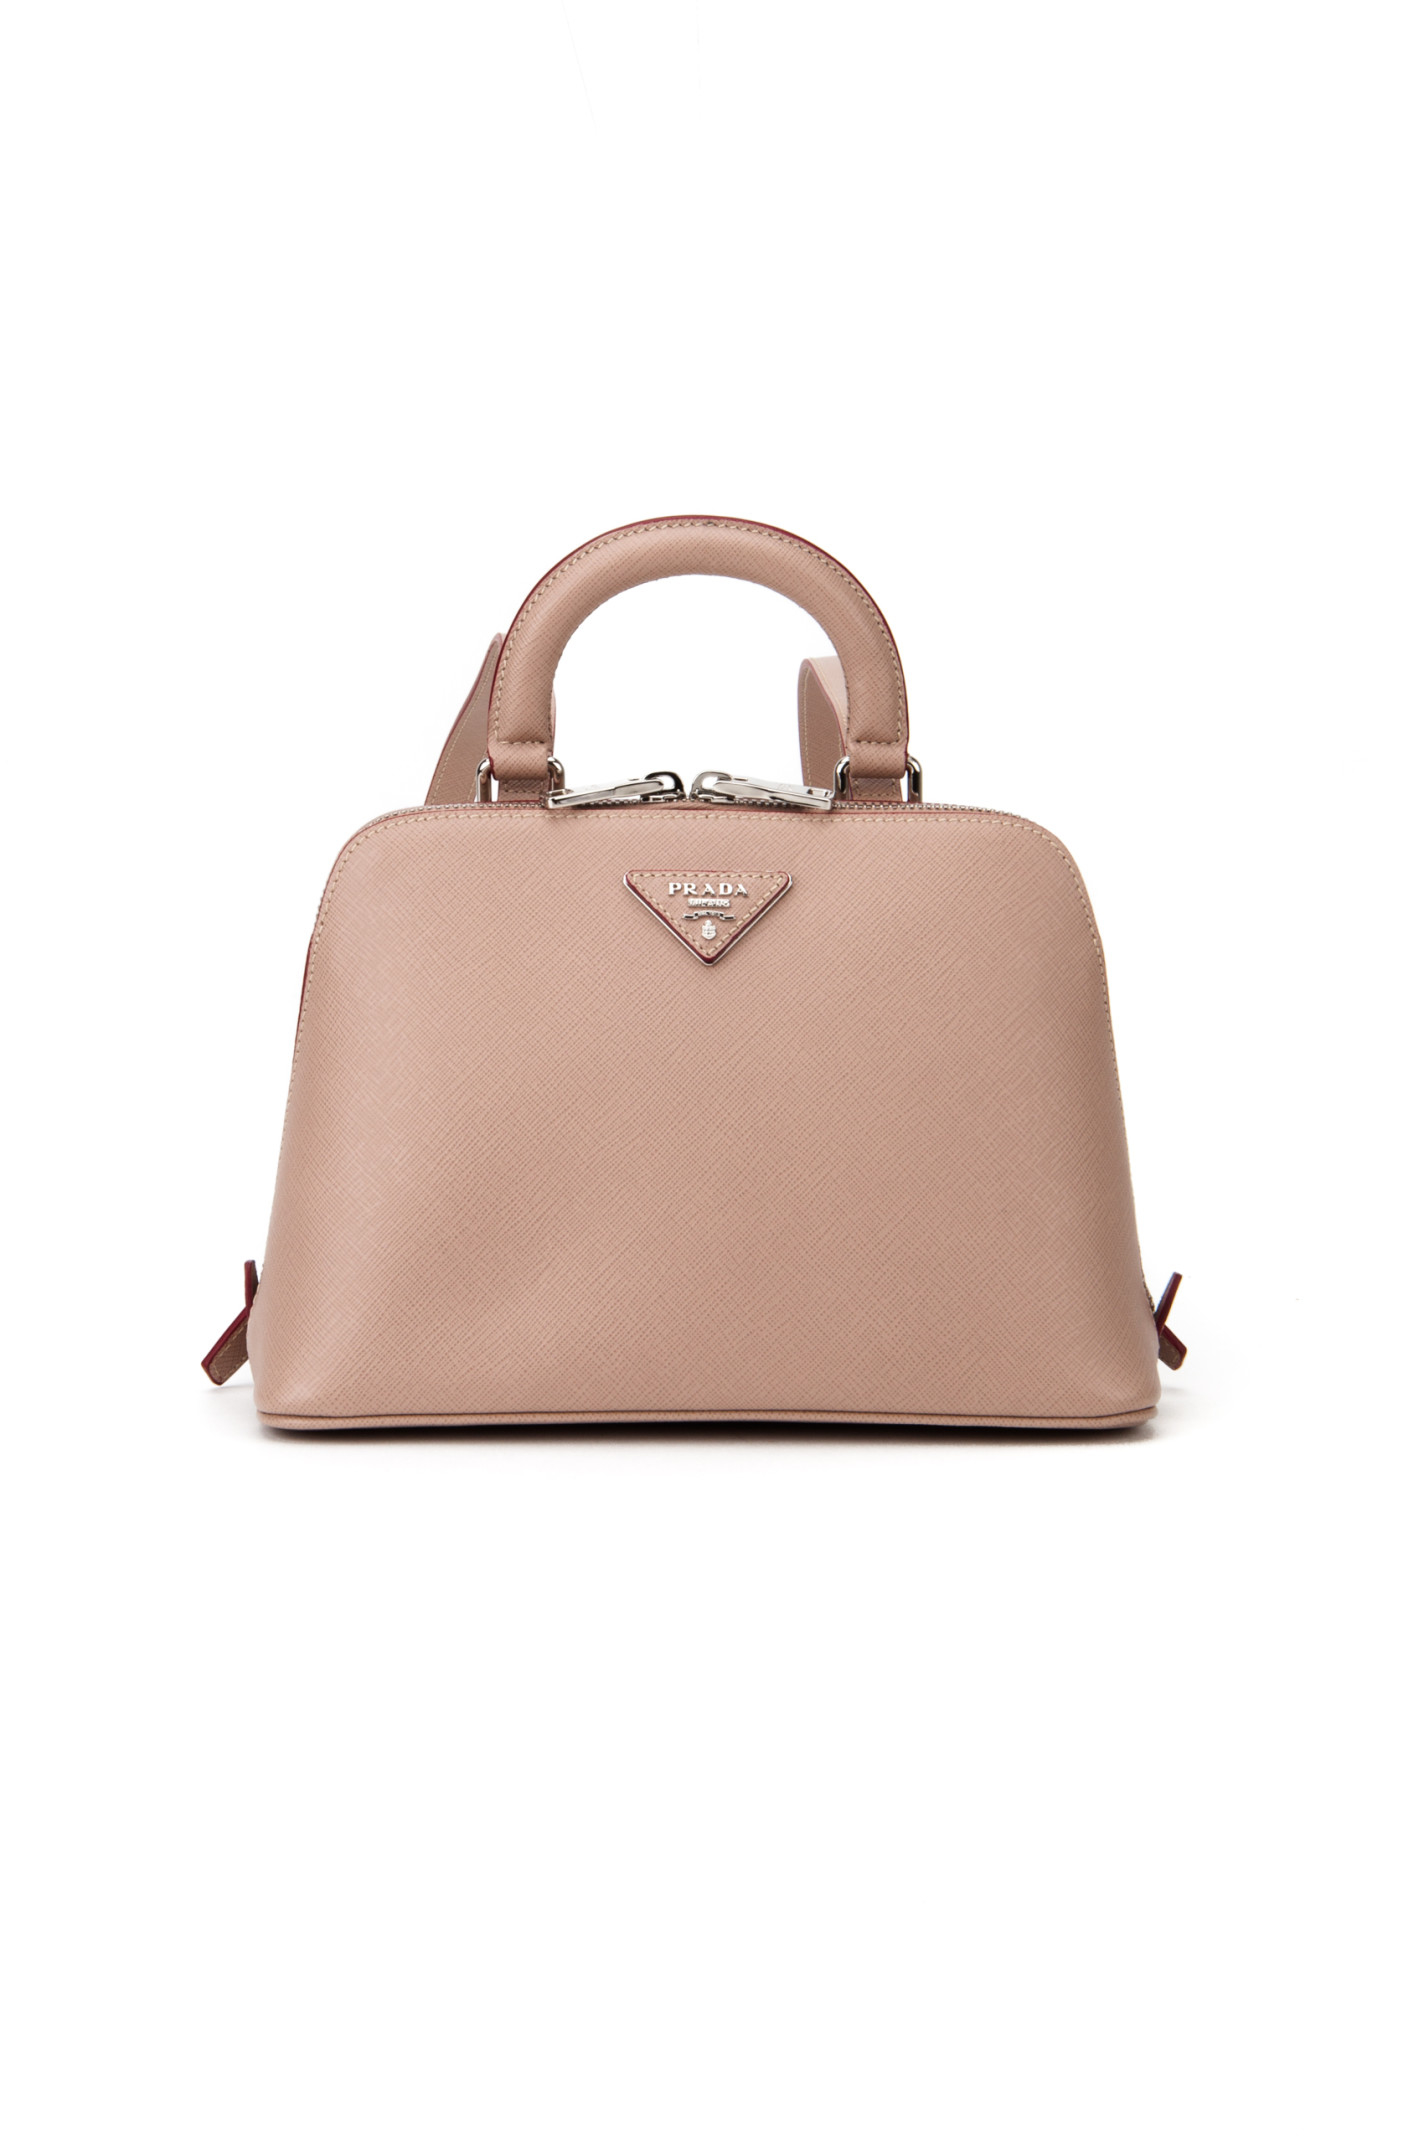 Prada Lux Saffiano Bag in Brown (CAMMEO R) | Lyst